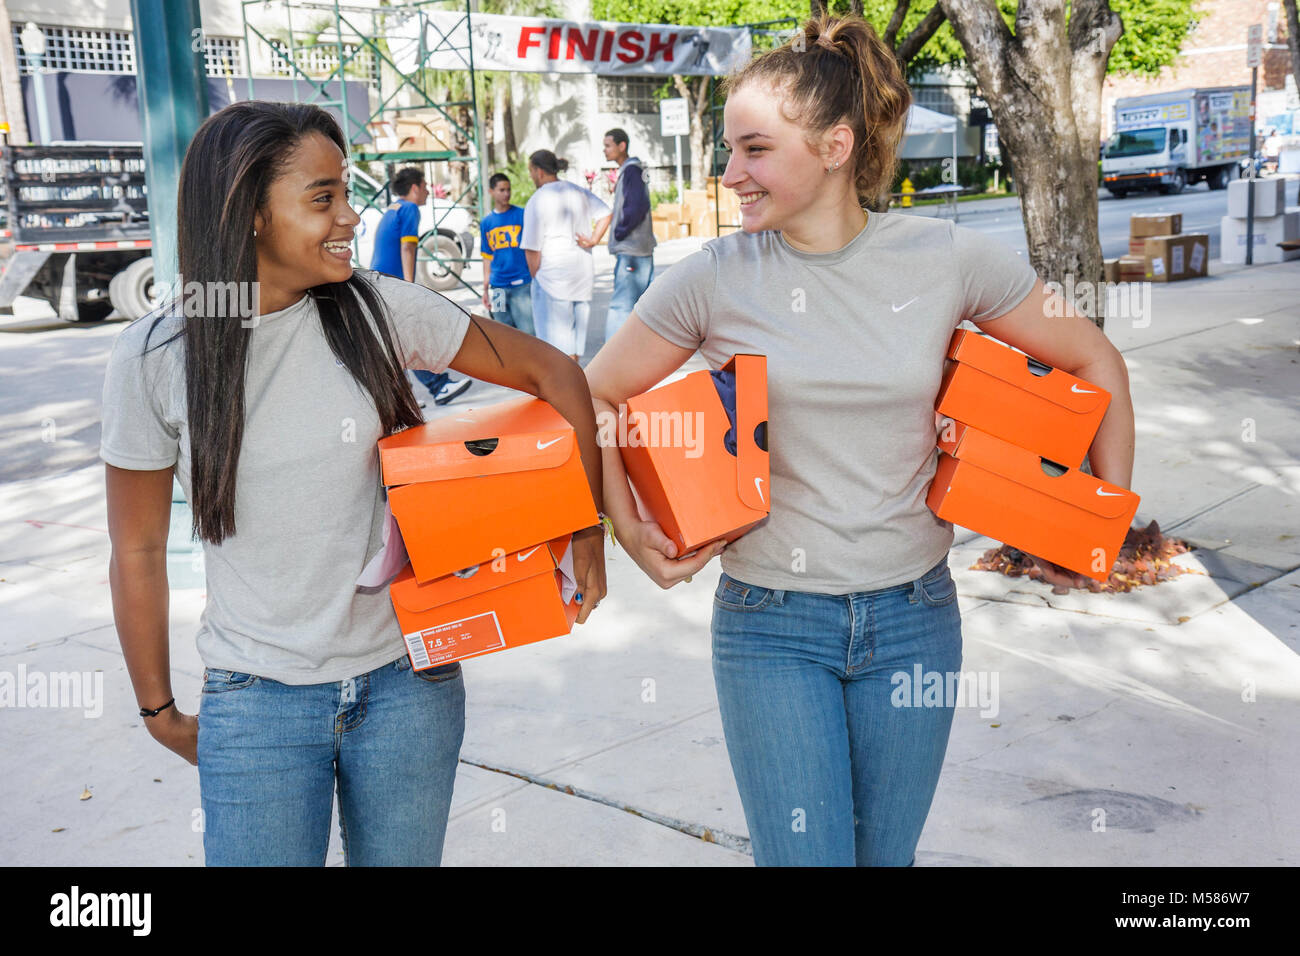 Carnaval 8K Run preparation community event teen volunteers student Black female girl - Stock Image